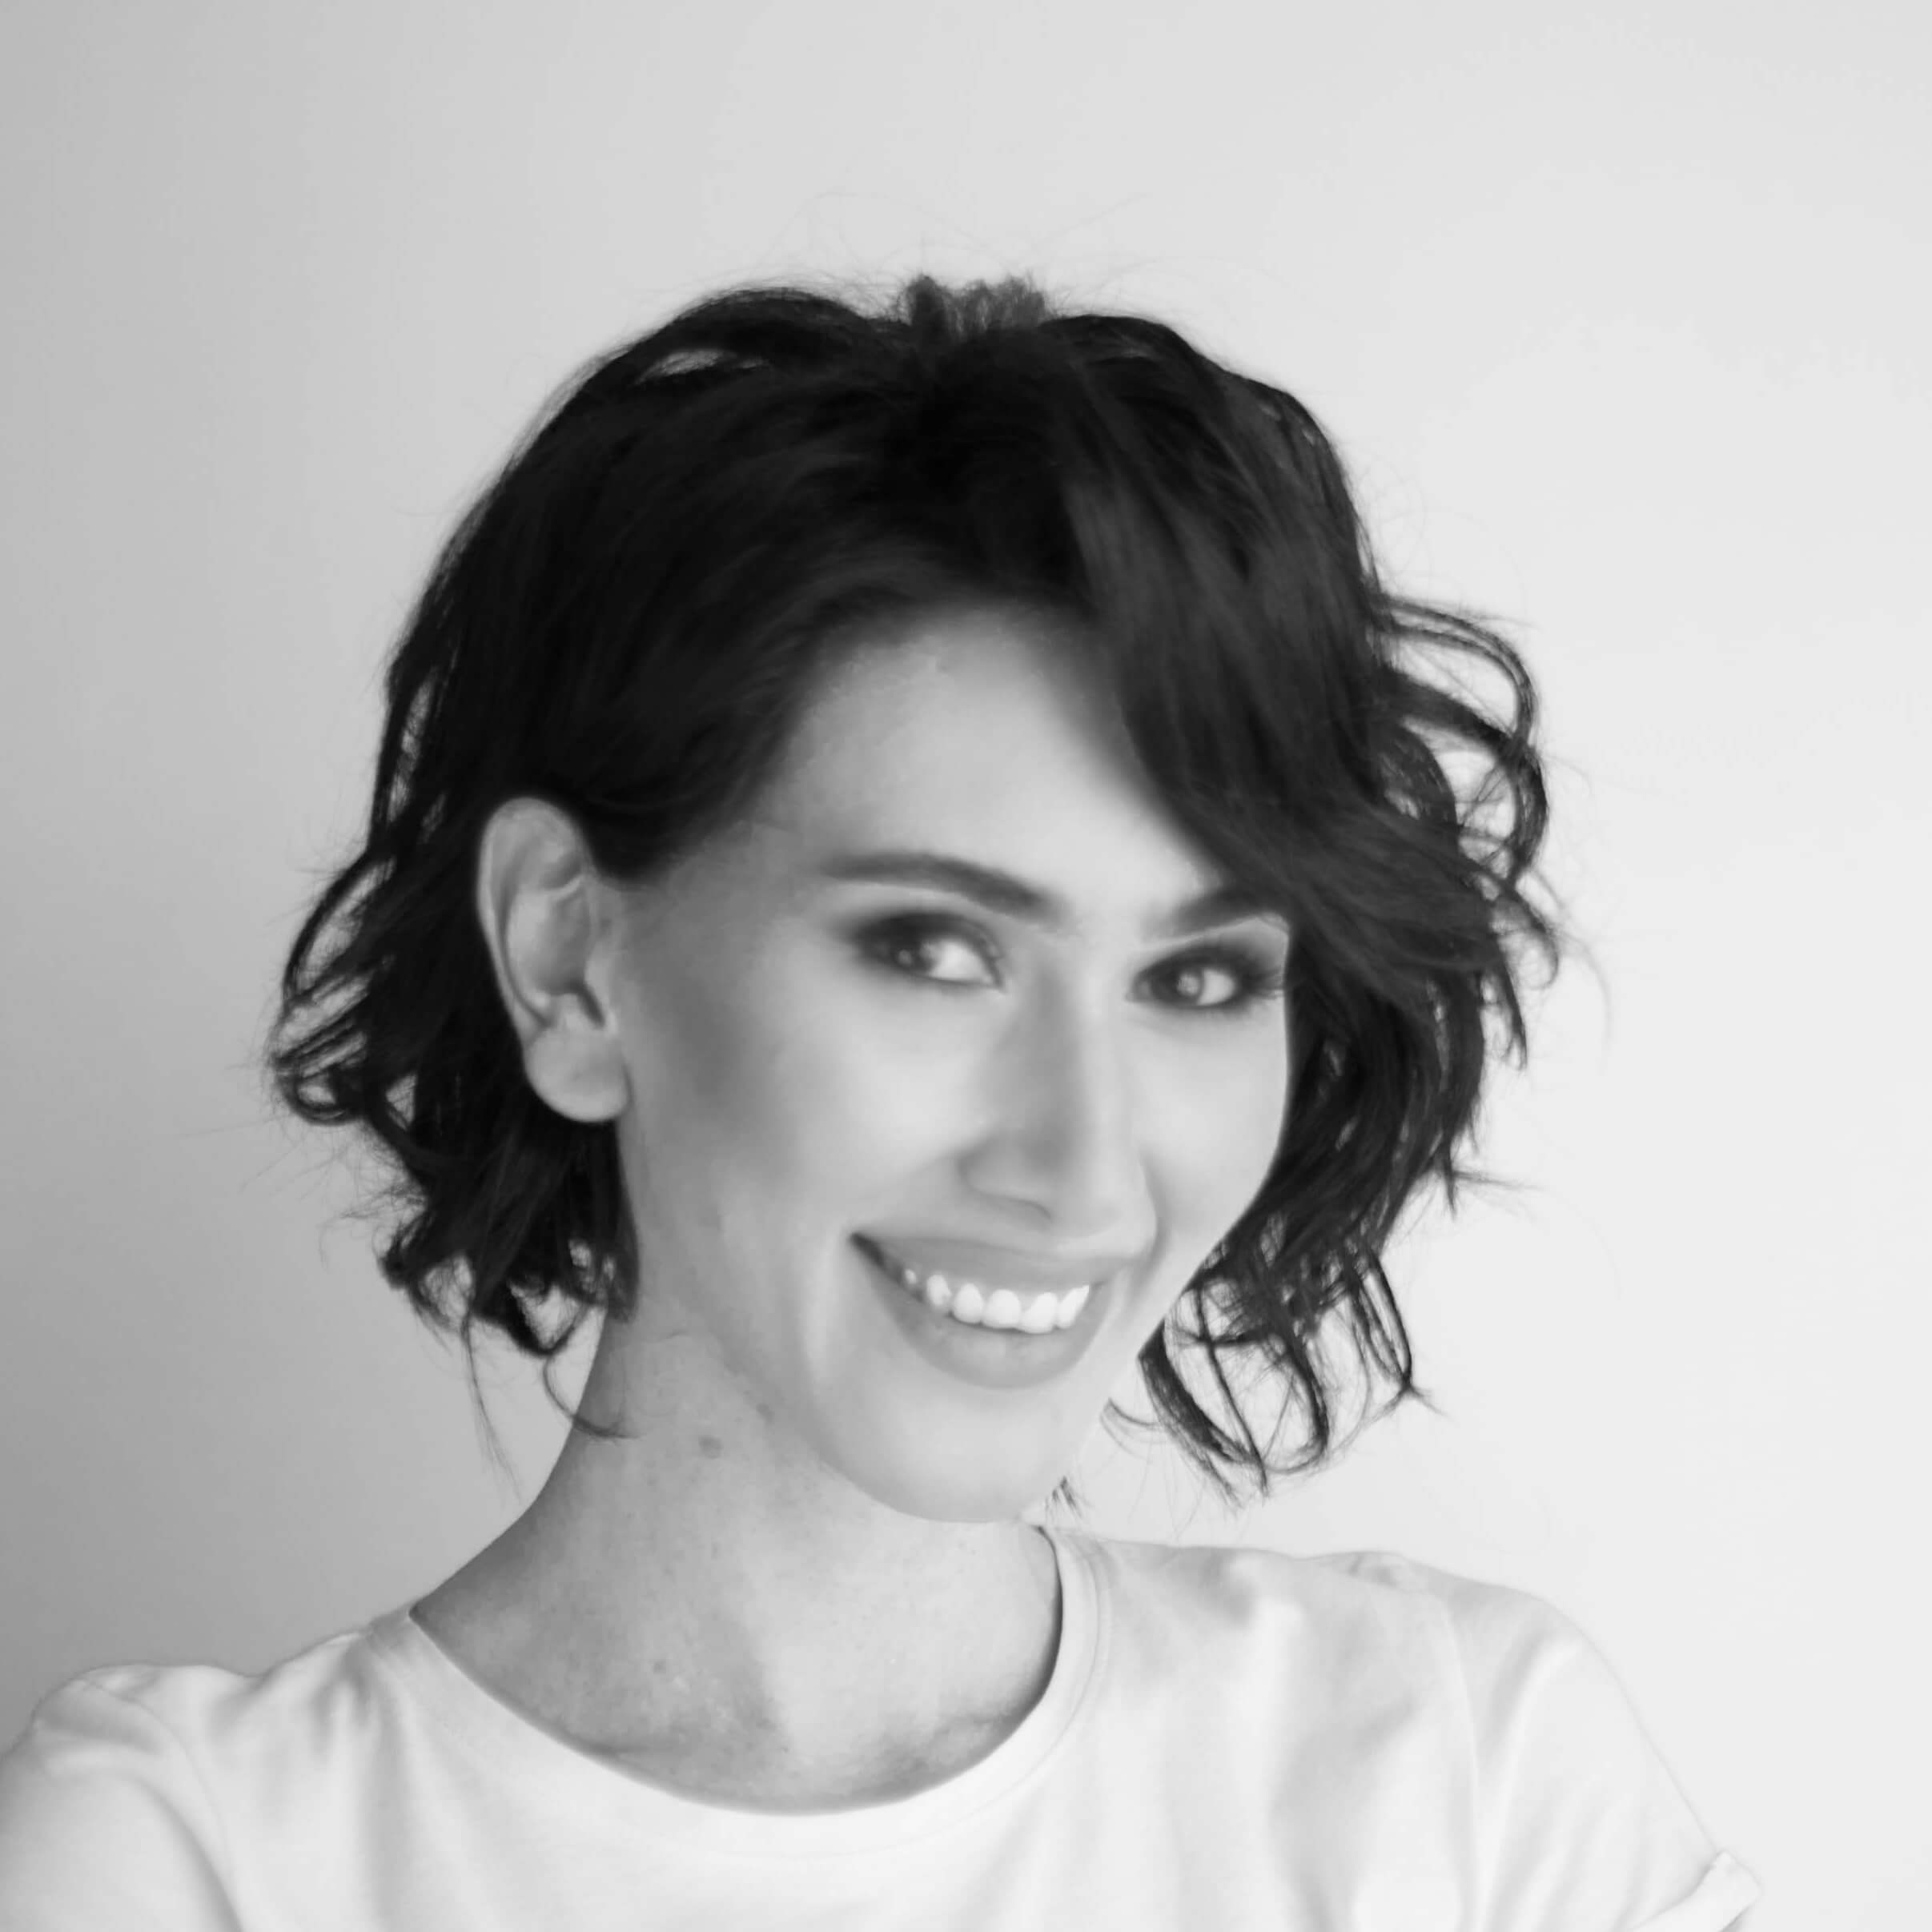 Syuzanna Melkonyan